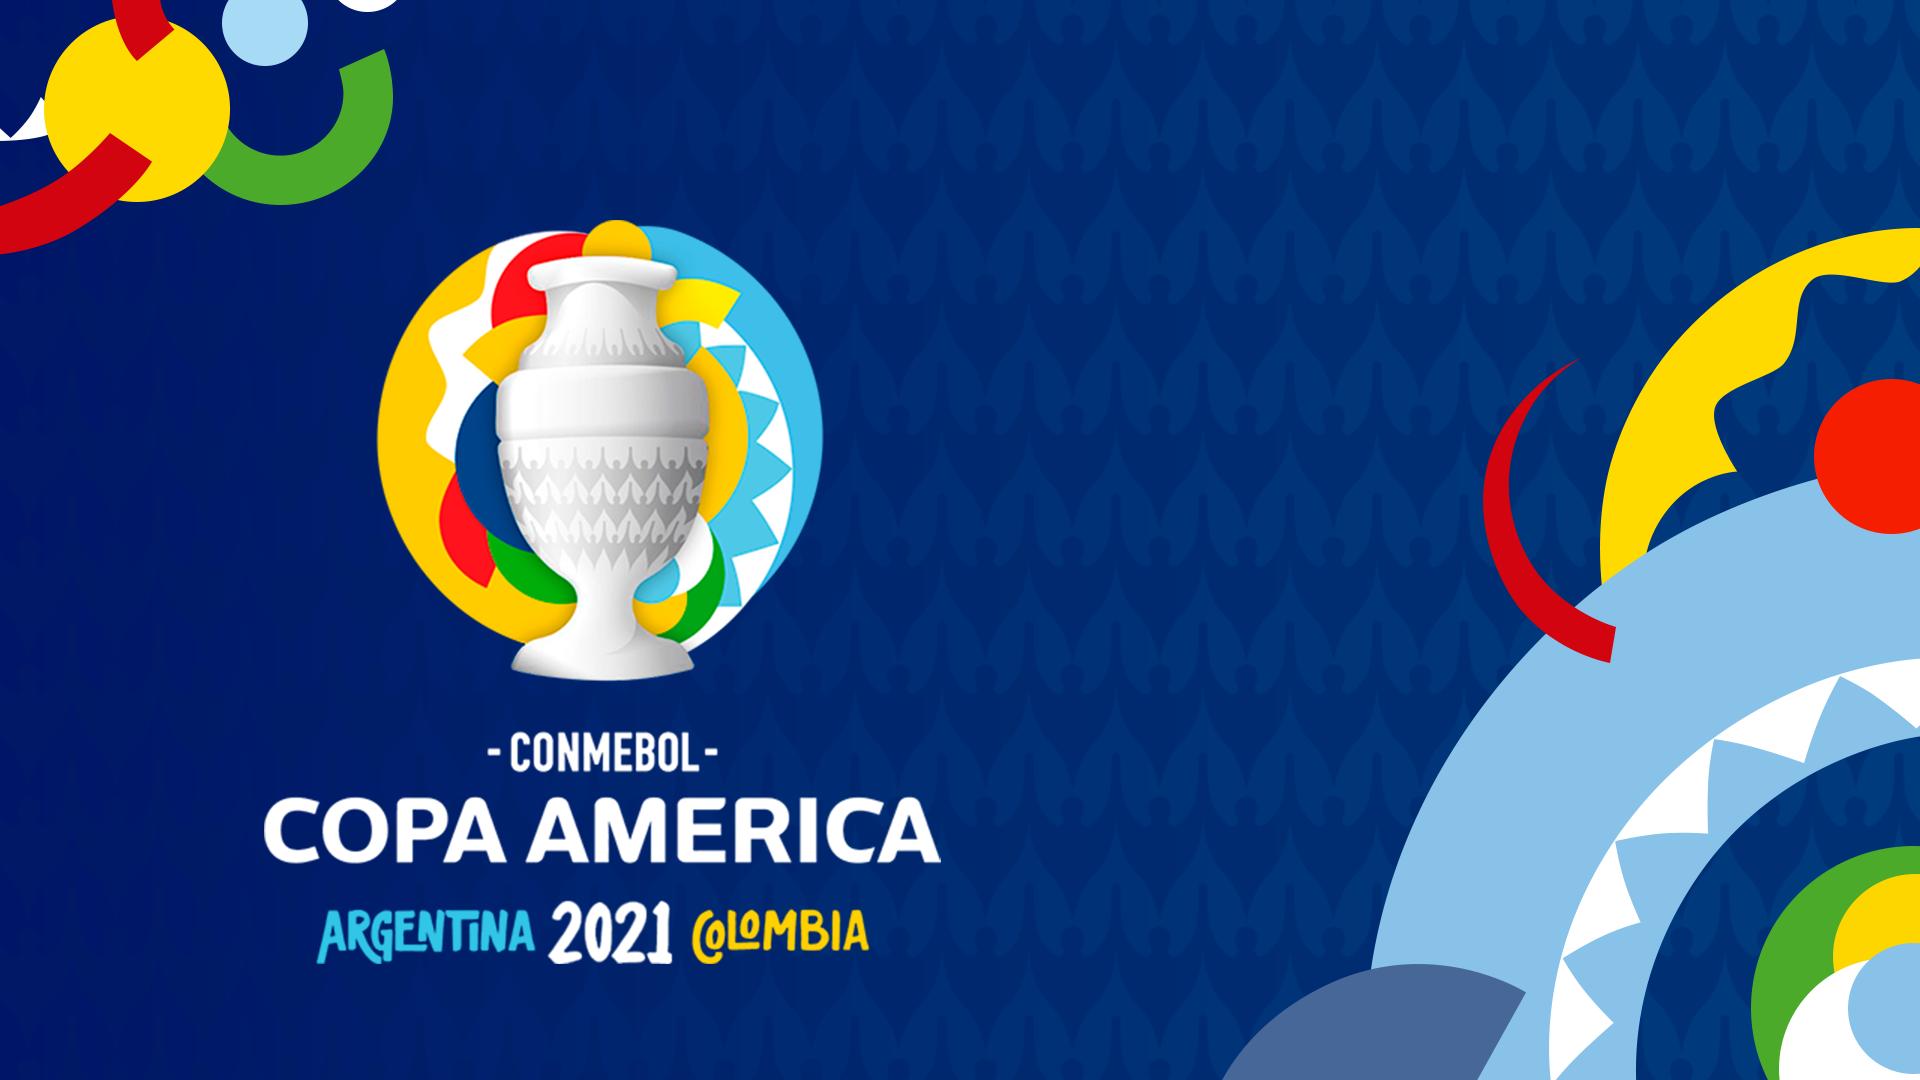 Sponsor majeur, Mastercard retire son logo de la Copa América